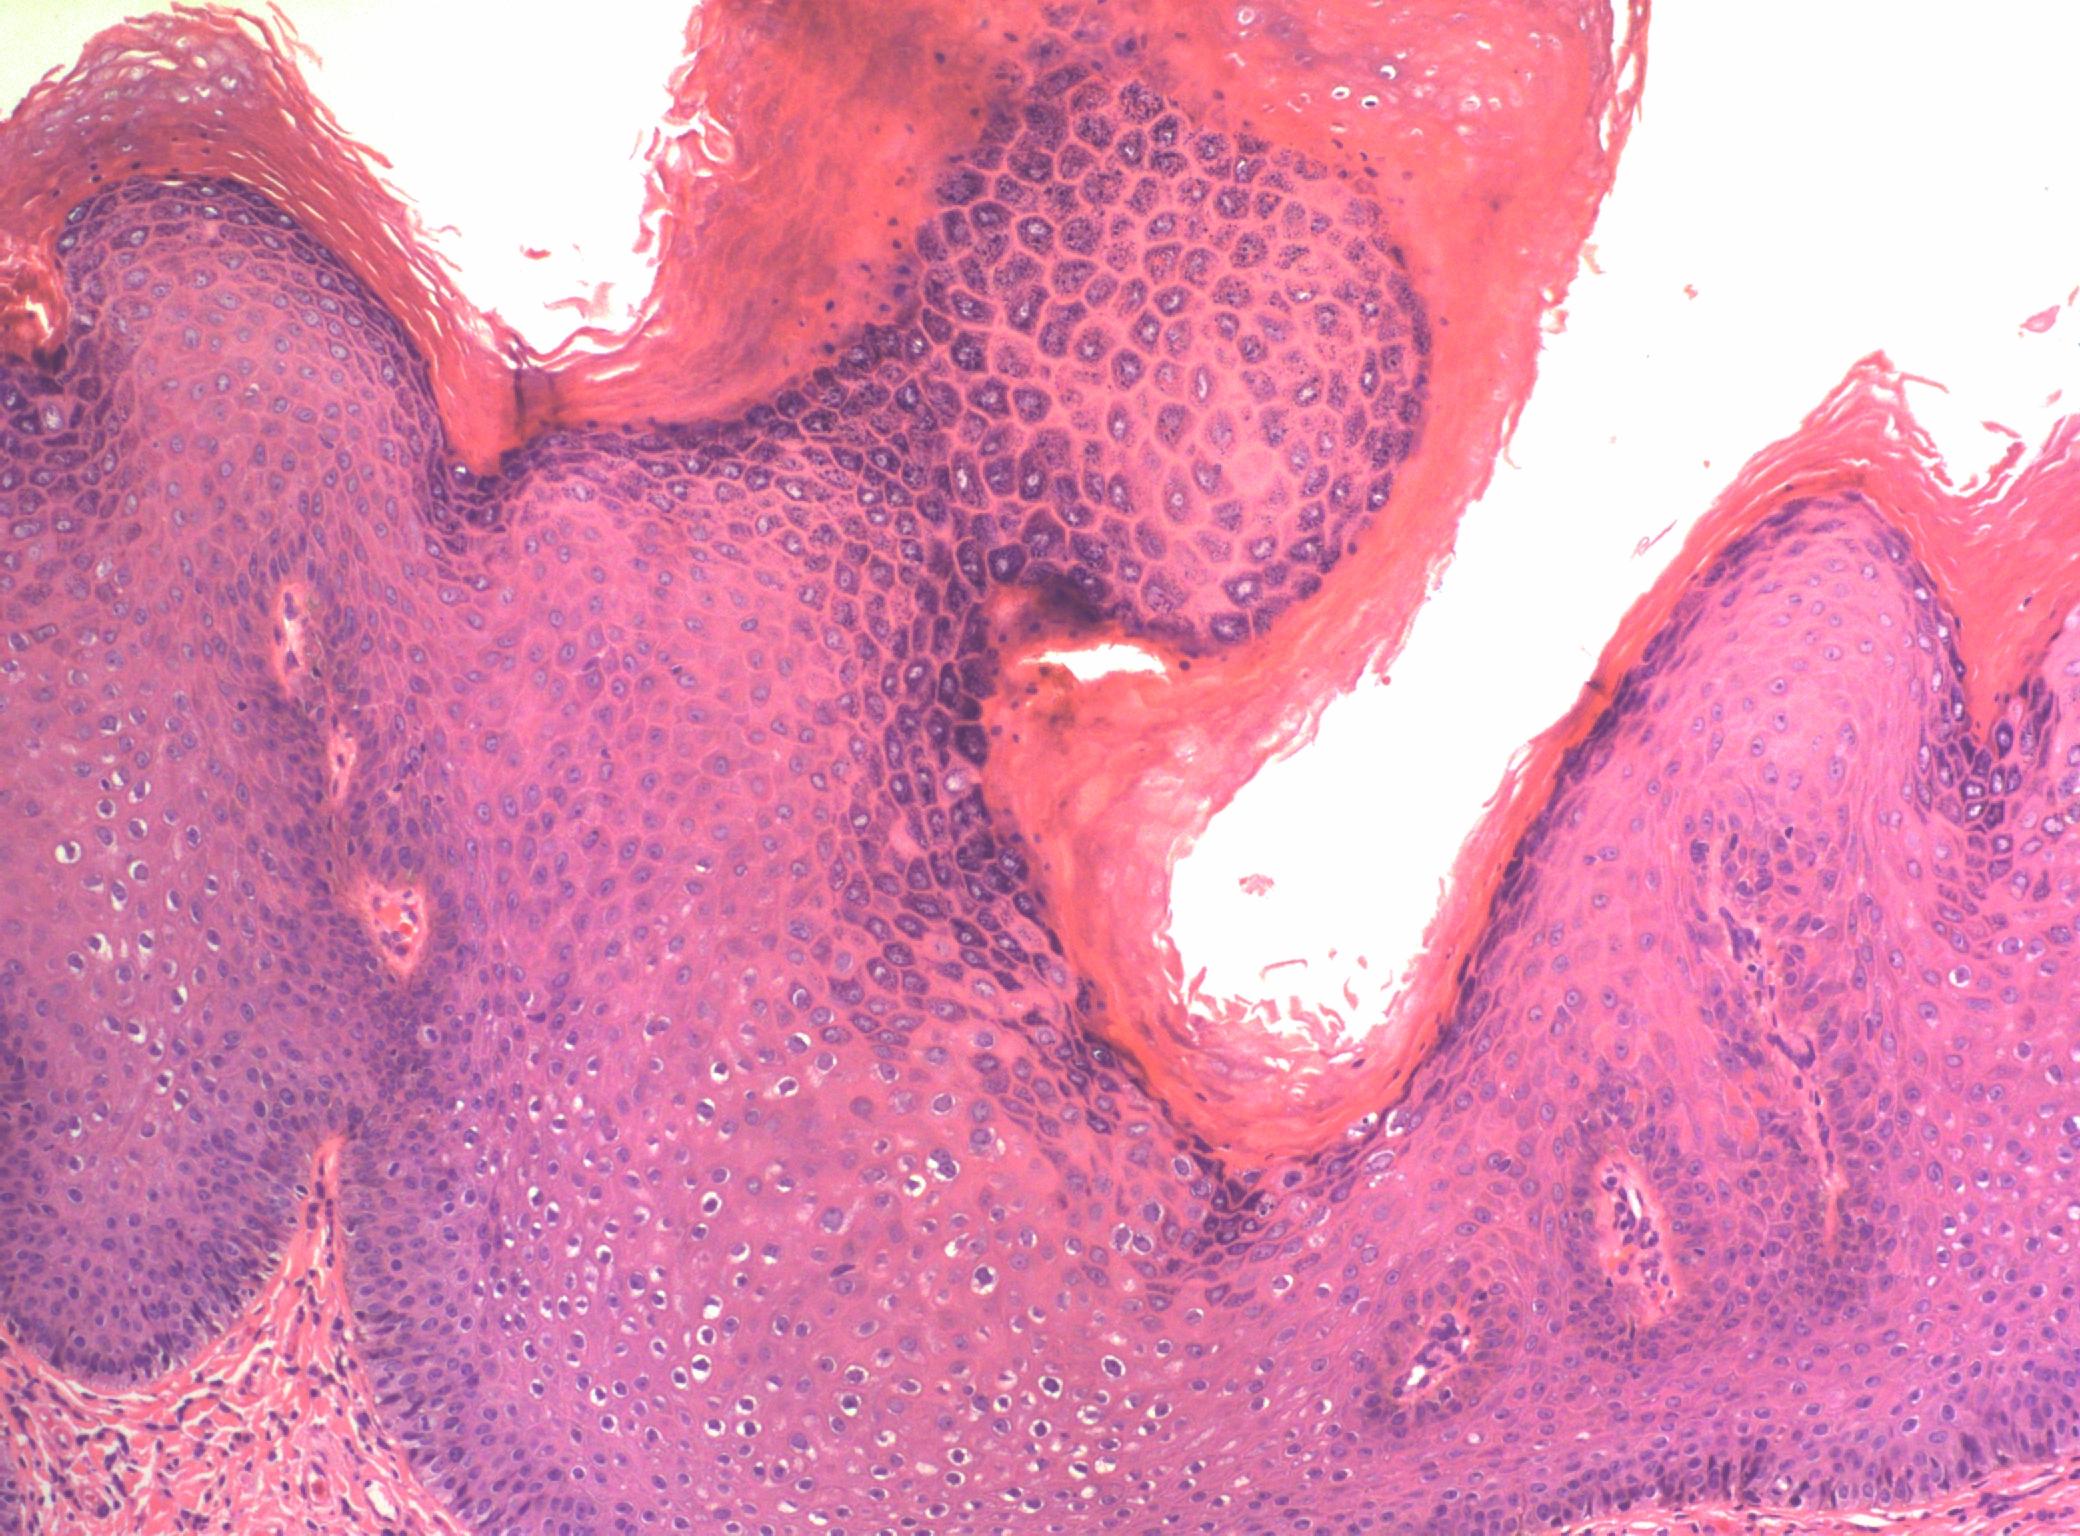 condyloma hyperkeratosis